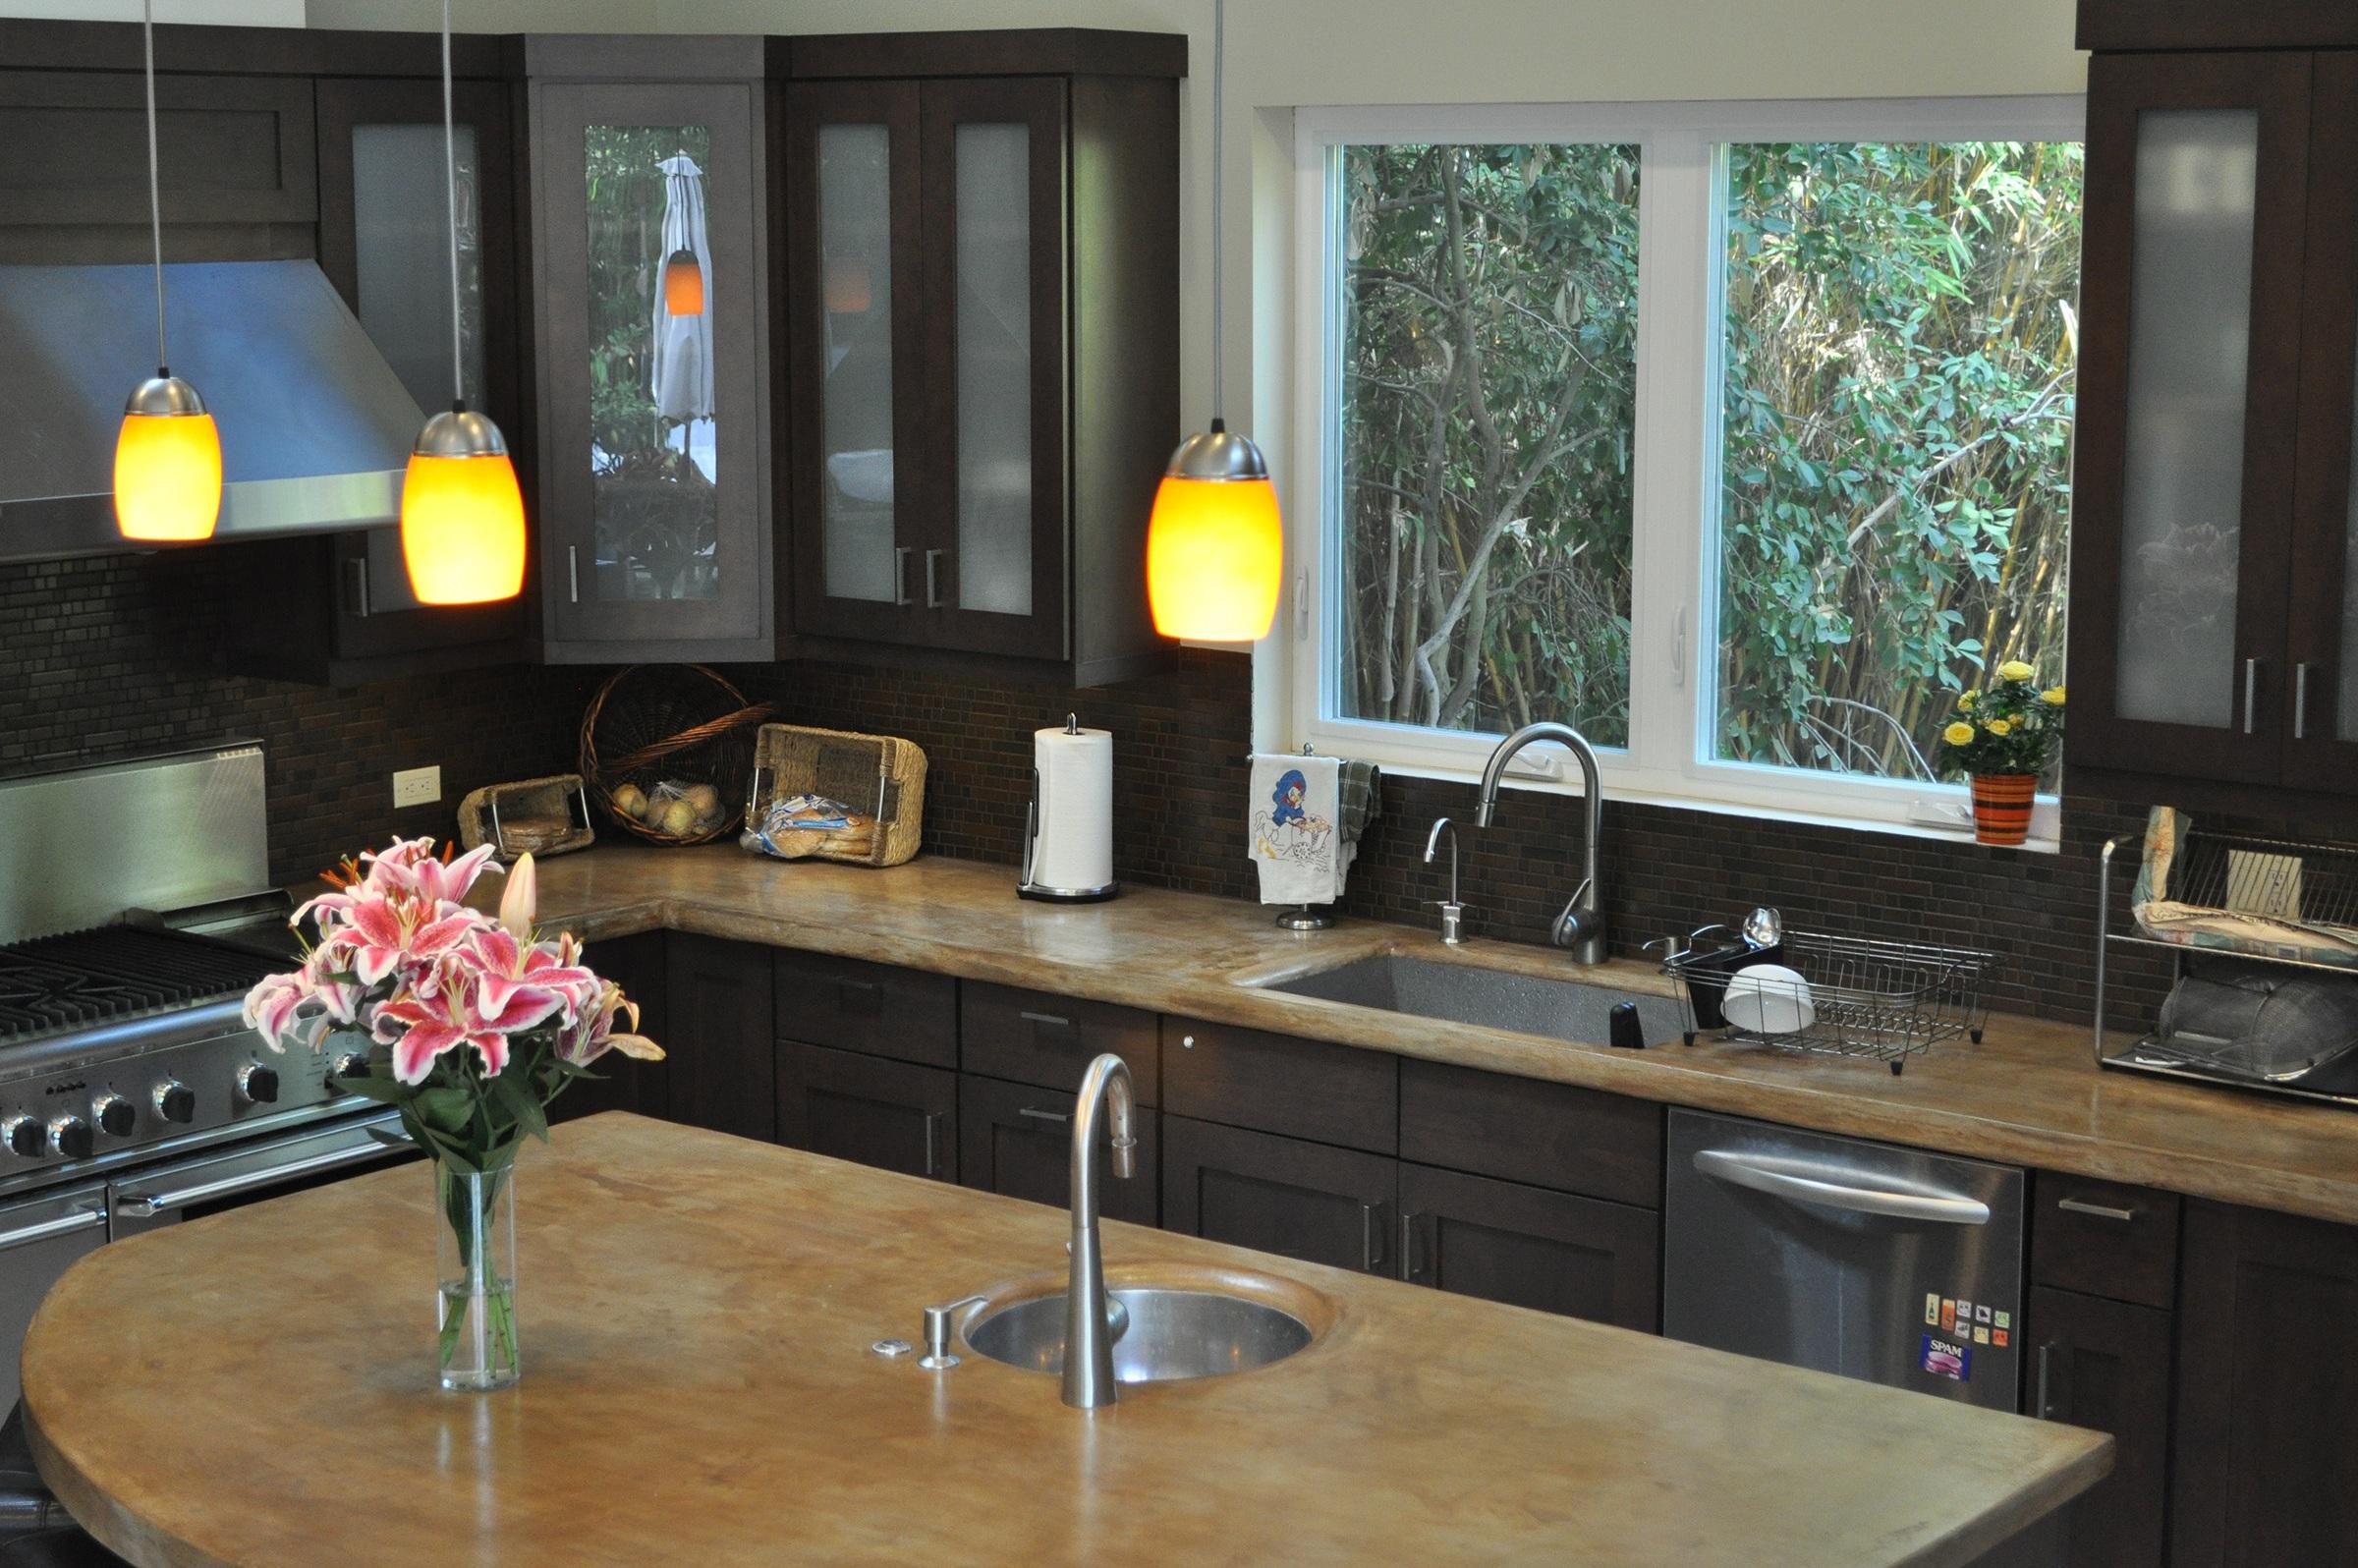 Eco Oasis - Culver CitySkylightsBi-fold glass wallConcrete islandSolar PowerGrey water